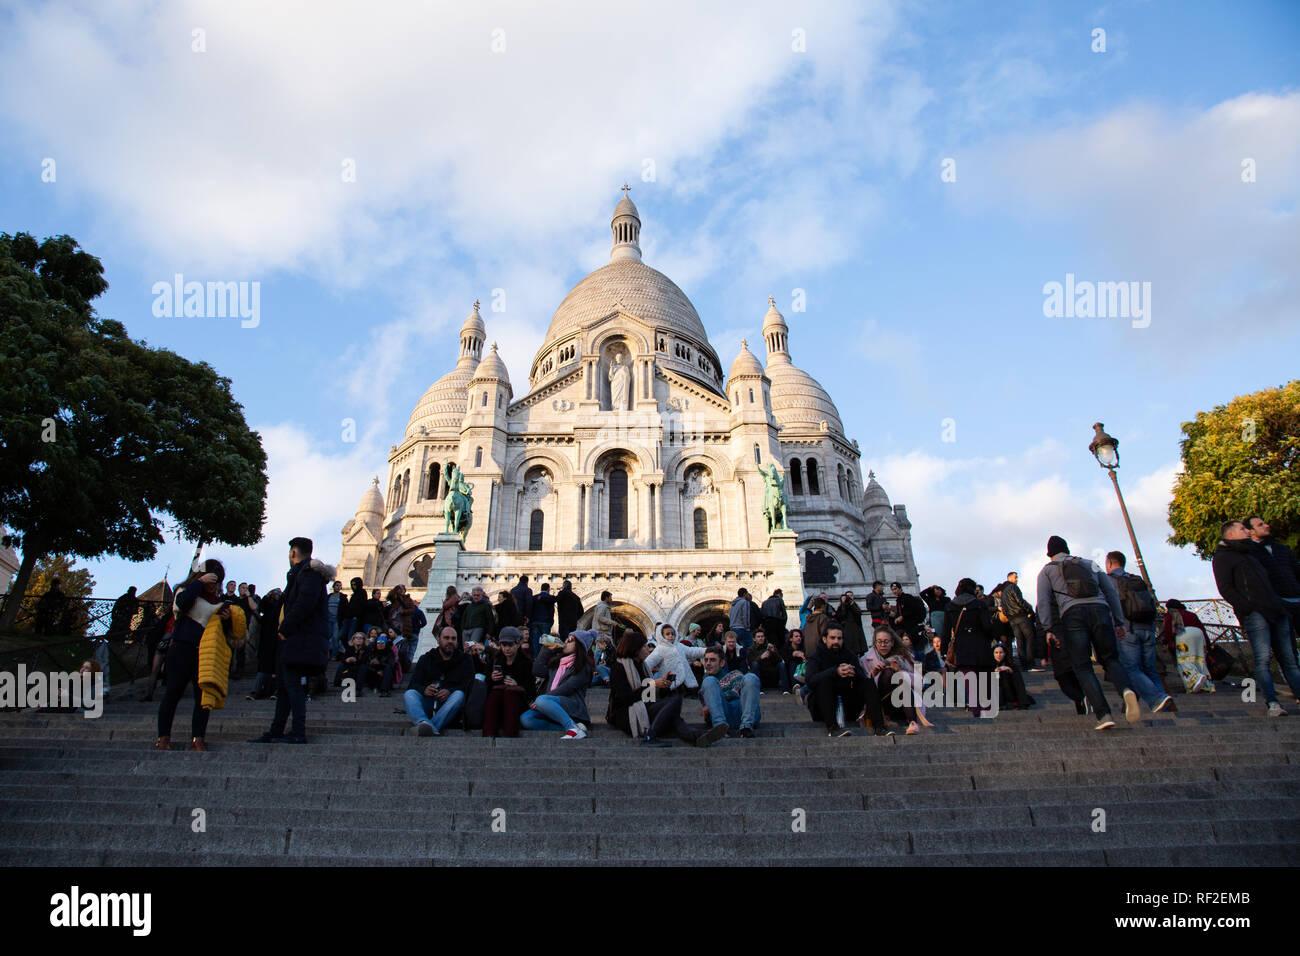 PARIS, FRANCE - NOVEMBER 9, 2018 - Basilica of the Sacred Heart of Paris, or Montmartre Sacré-Cœur, is a popular landmark and the 2nd most visited mon Stock Photo